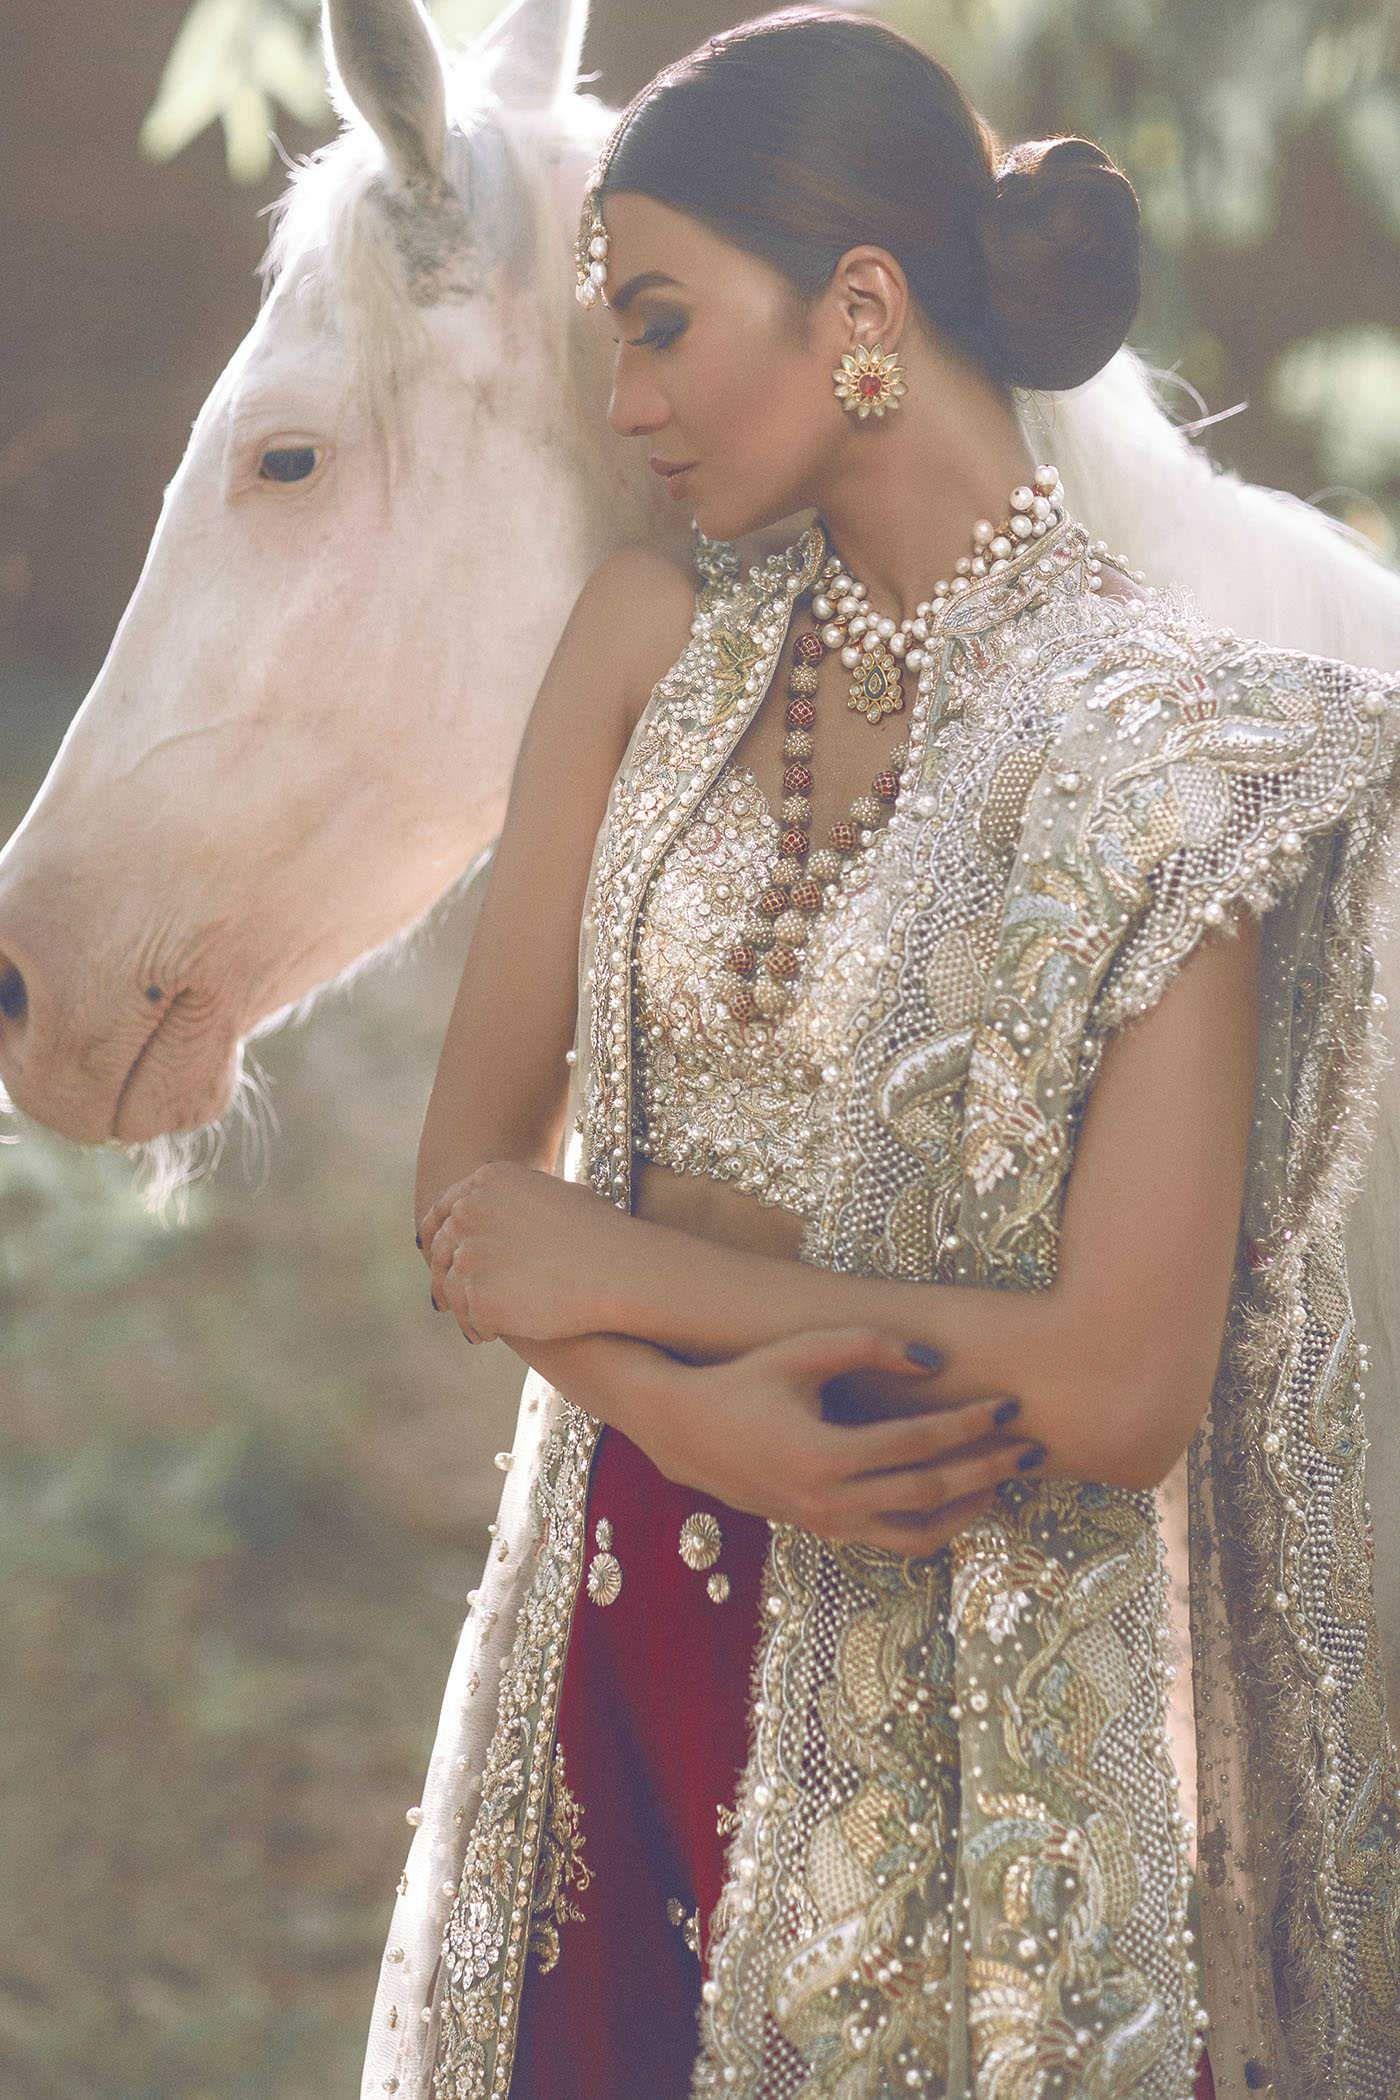 Jasmine Court by Elan, Pakistani designer, wedding dress